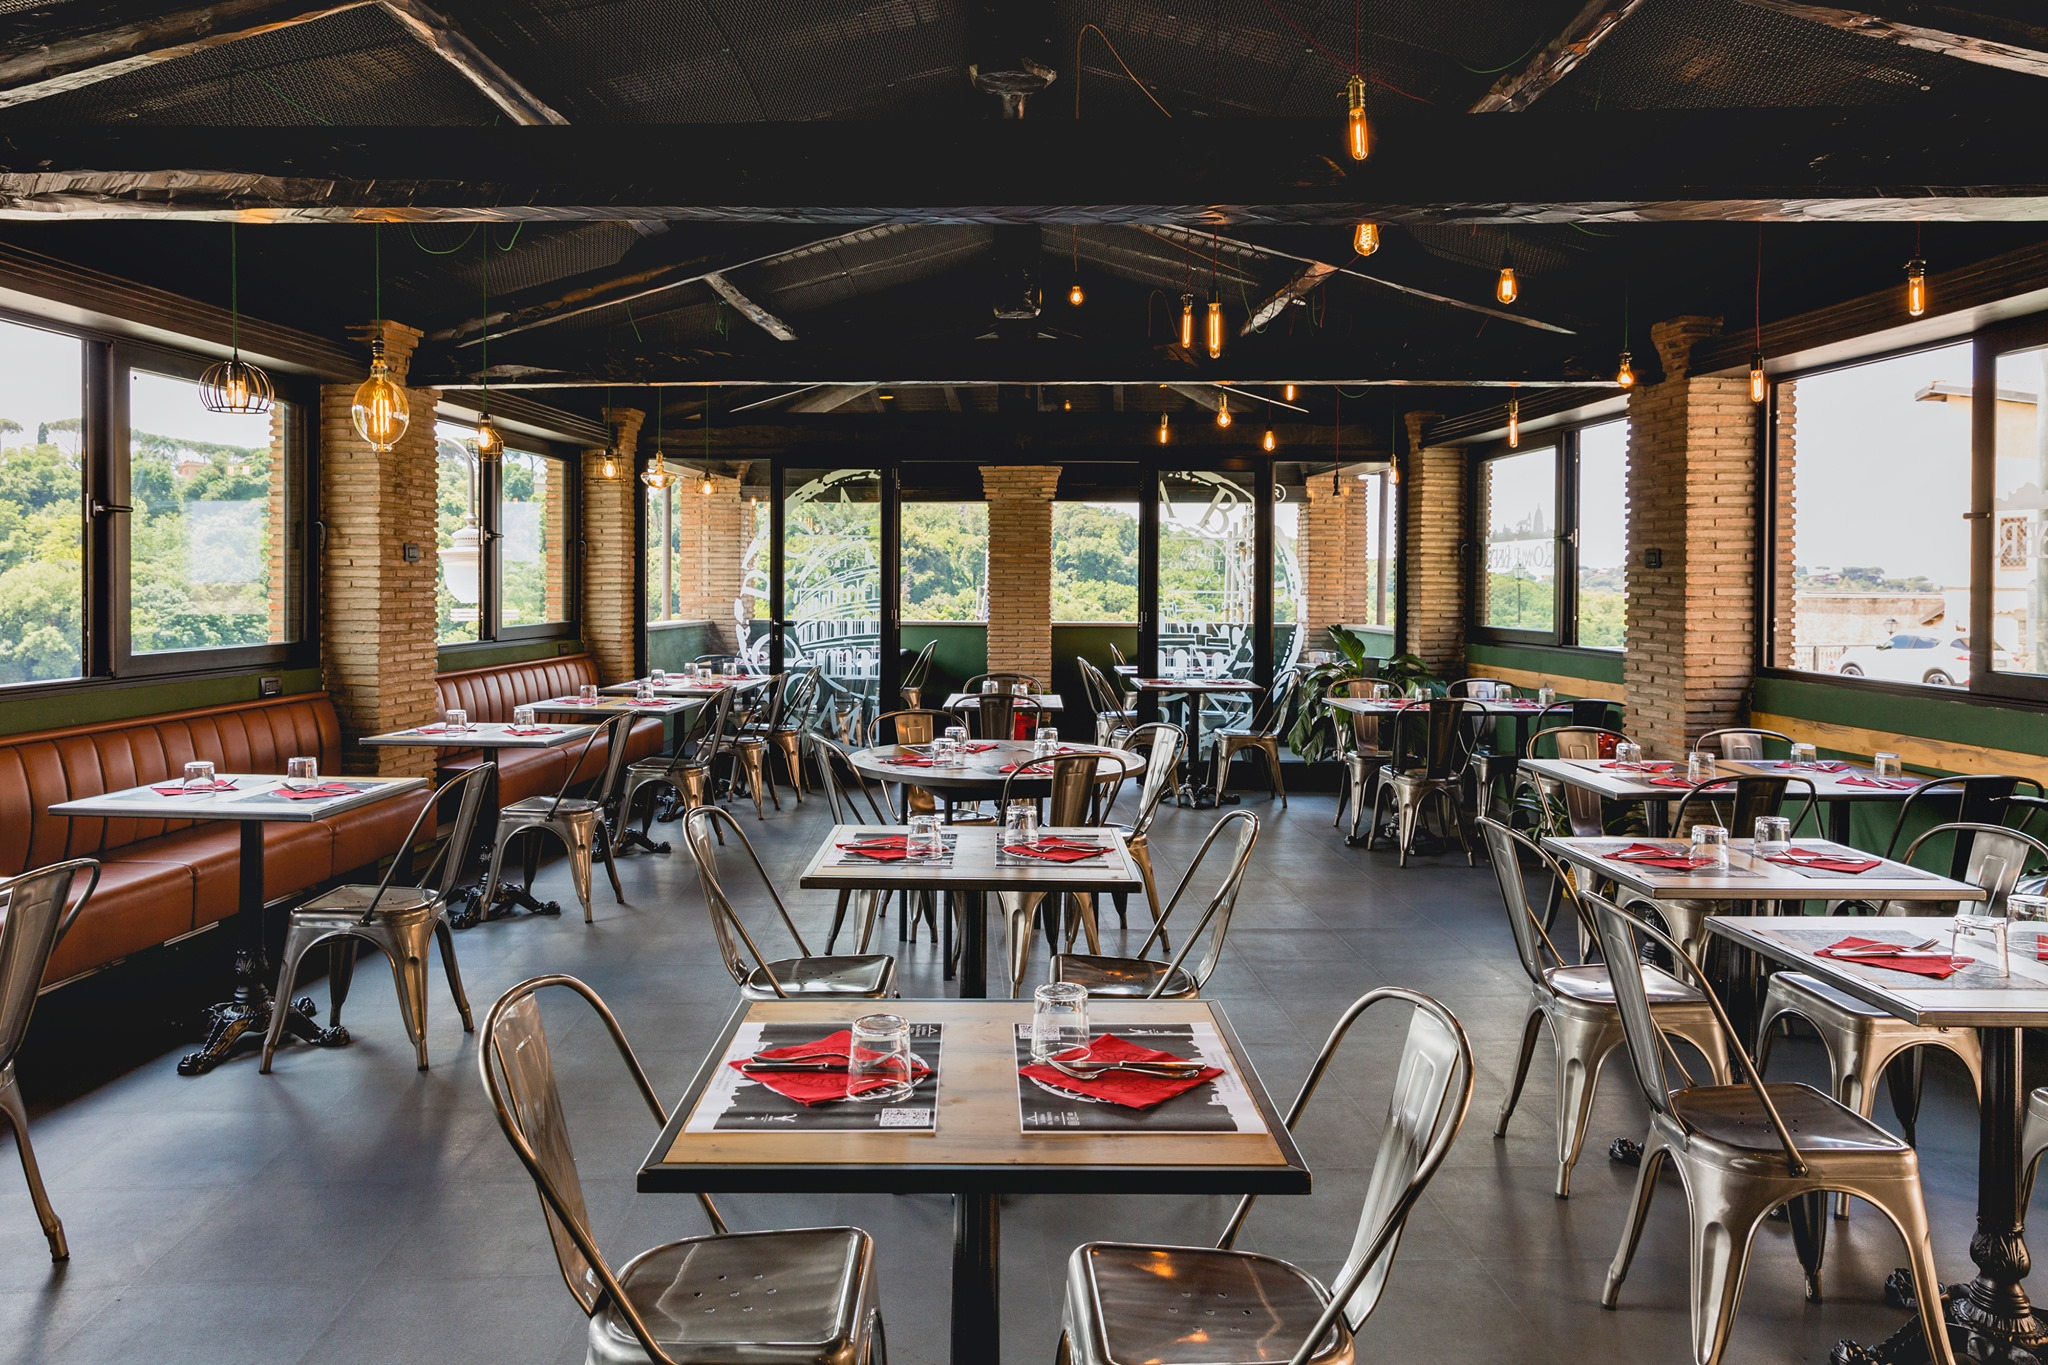 tavoli-sedie-pranzo-ferragosto-2021